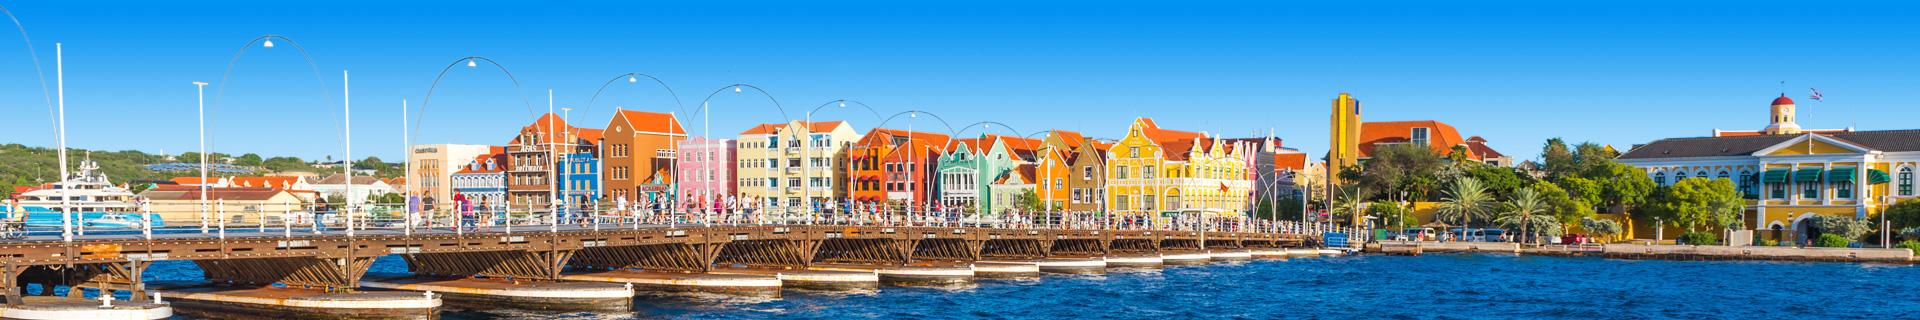 Gekleurde huisjes in Curacao